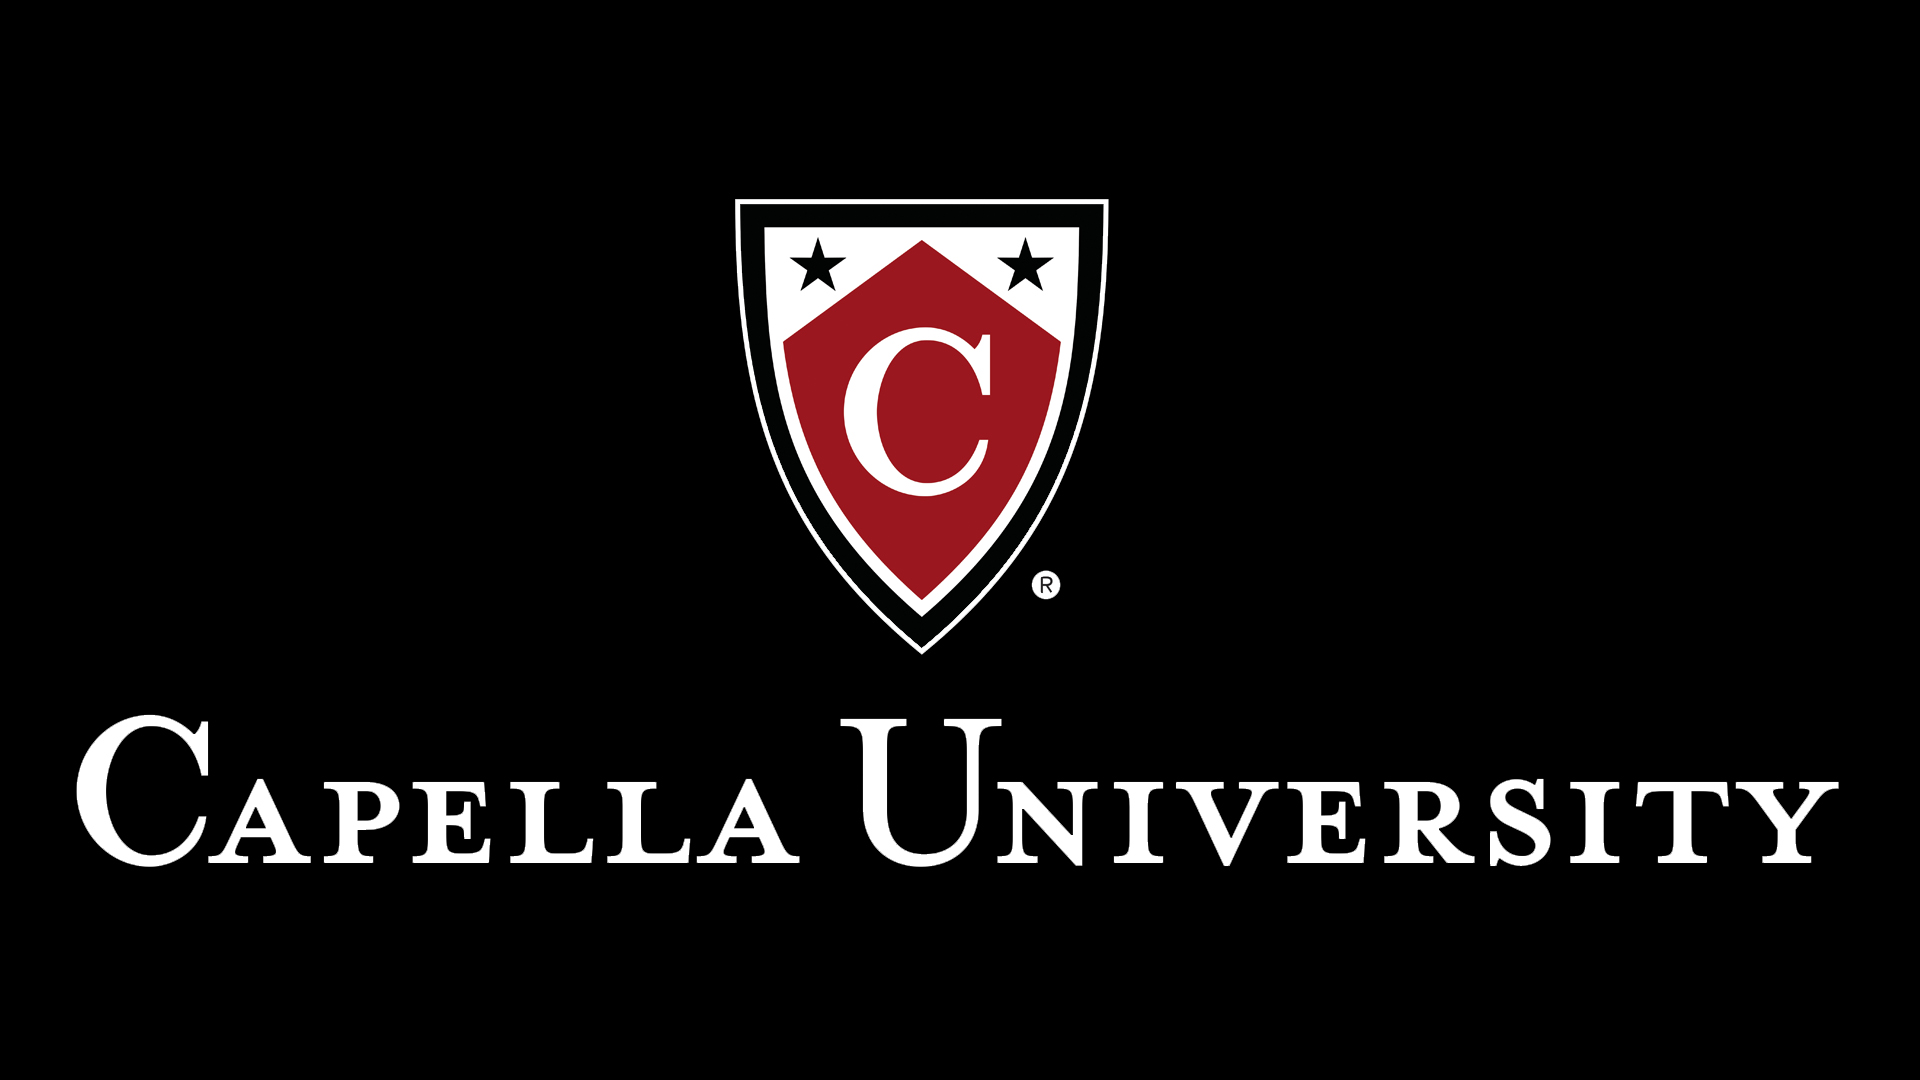 capella-university